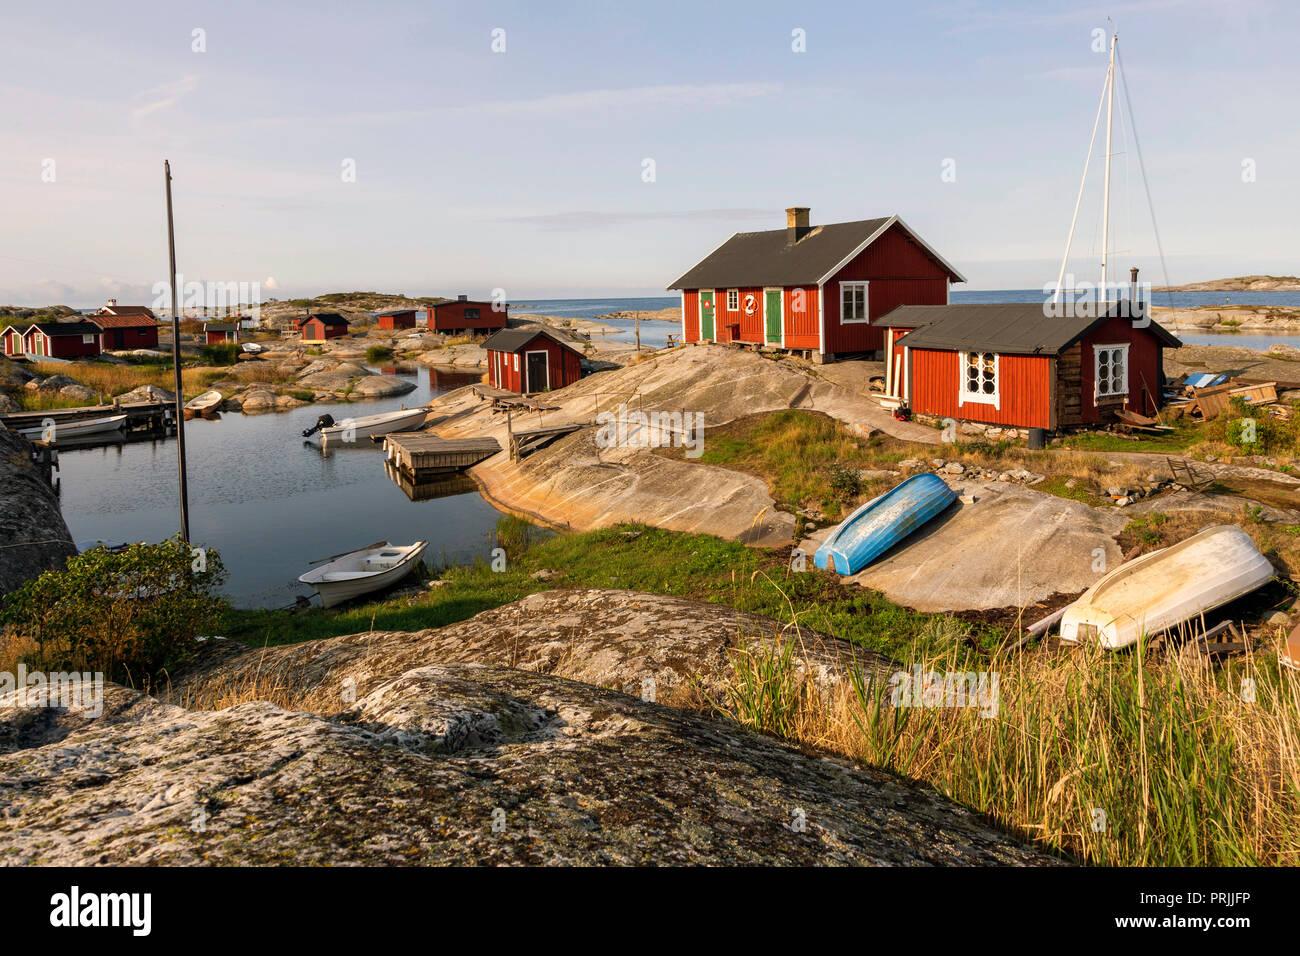 Red wooden houses on the rocky coast, Stockholm archipelago, Huvudskär archipelago island, Sweden Stock Photo